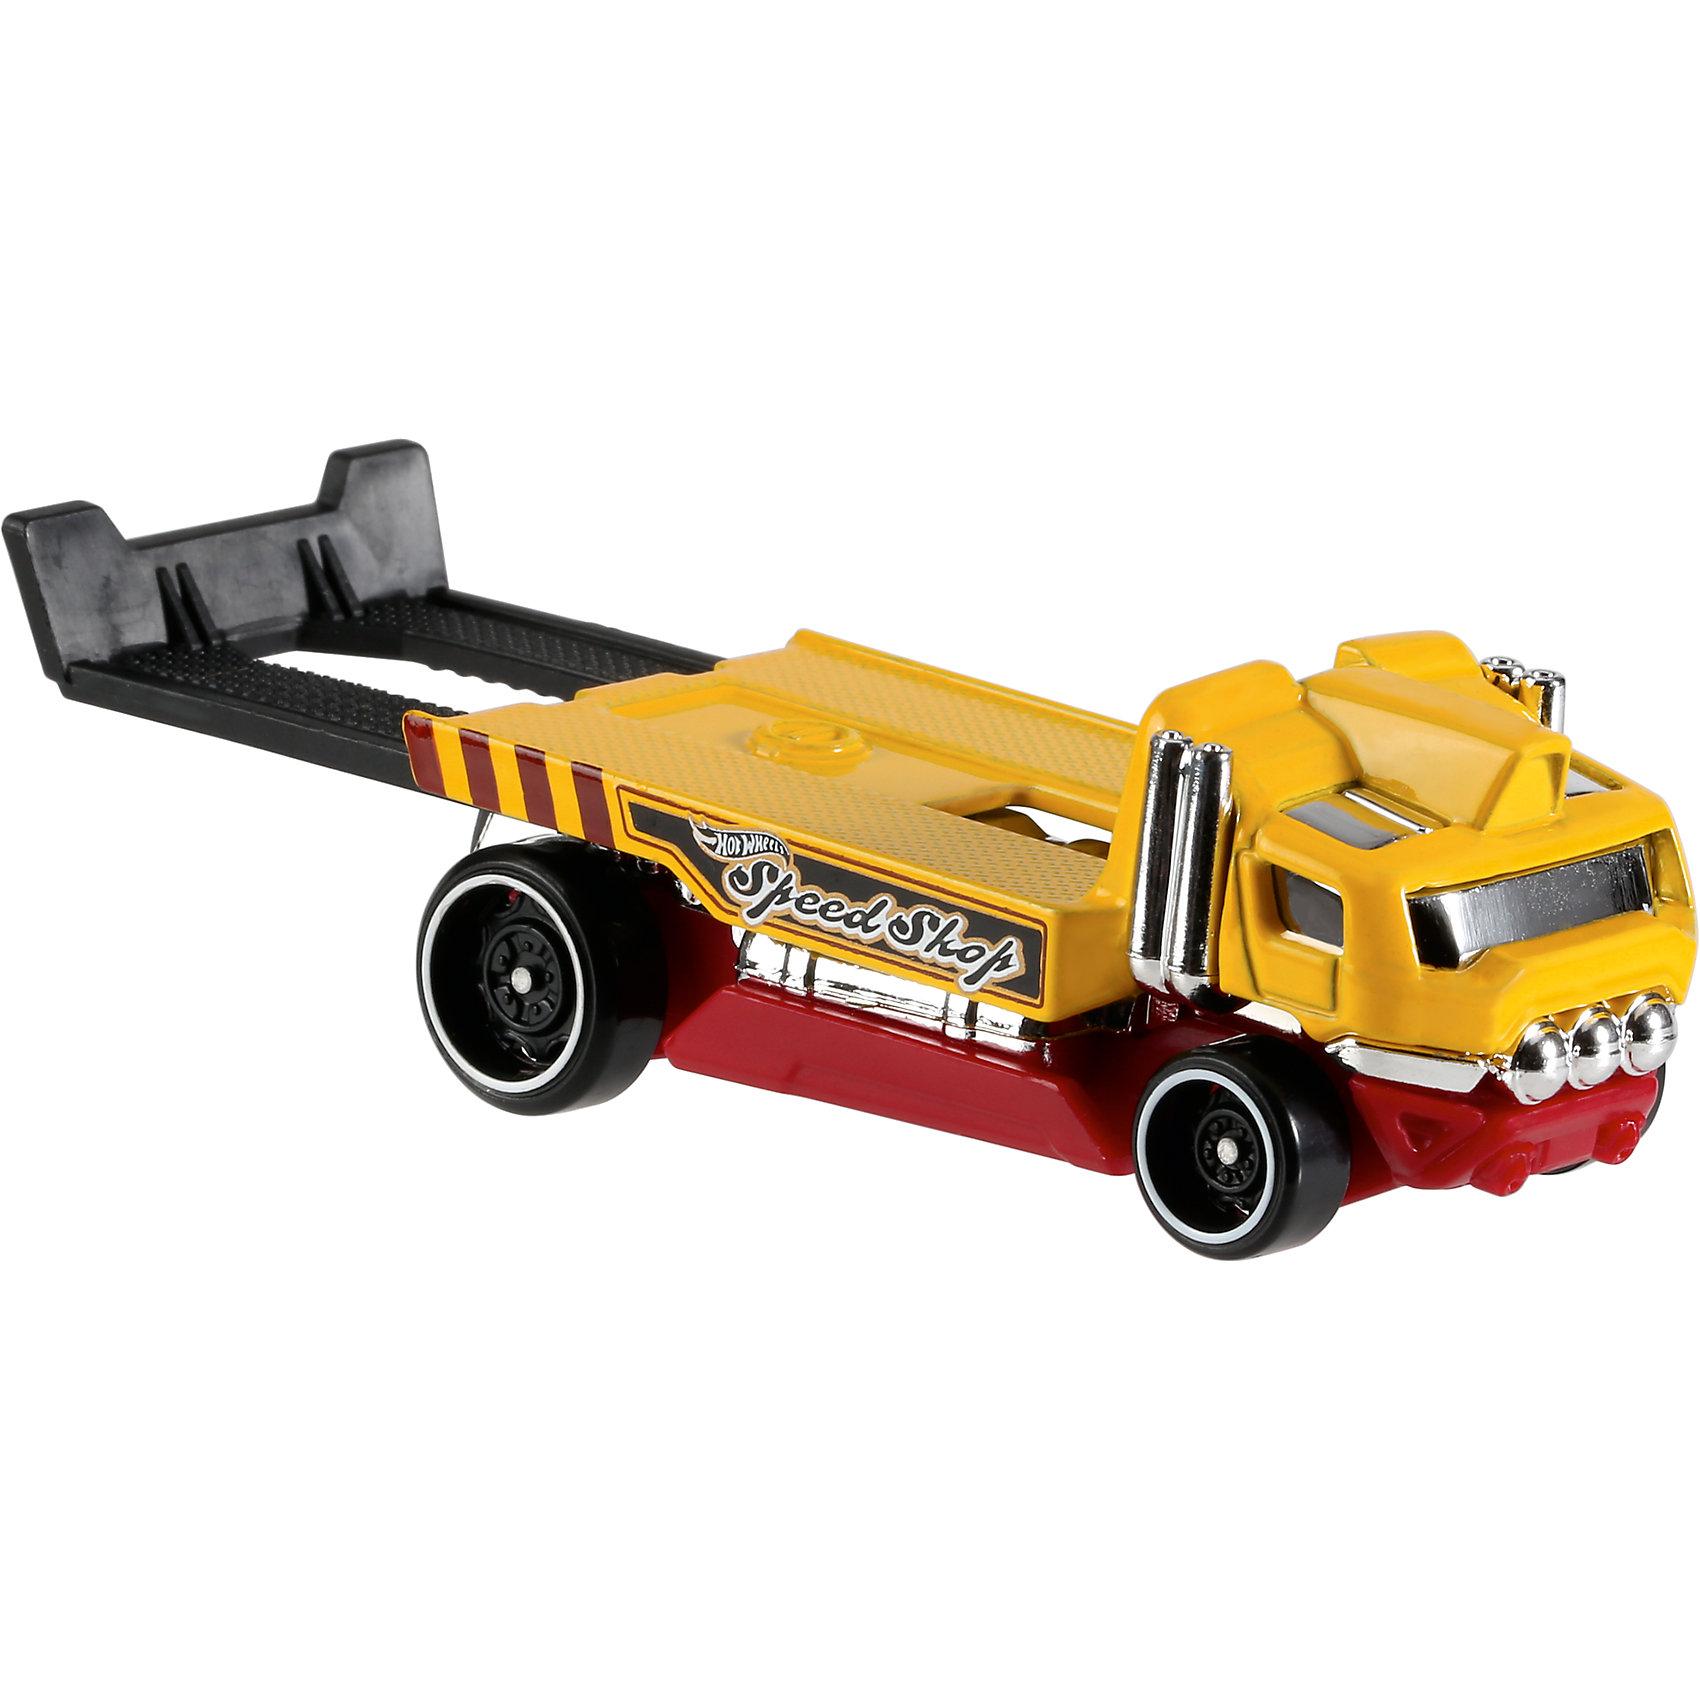 Базовая машинка Hot Wheels, The HaulinatorПопулярные игрушки<br><br><br>Ширина мм: 110<br>Глубина мм: 45<br>Высота мм: 110<br>Вес г: 30<br>Возраст от месяцев: 36<br>Возраст до месяцев: 96<br>Пол: Мужской<br>Возраст: Детский<br>SKU: 7111089